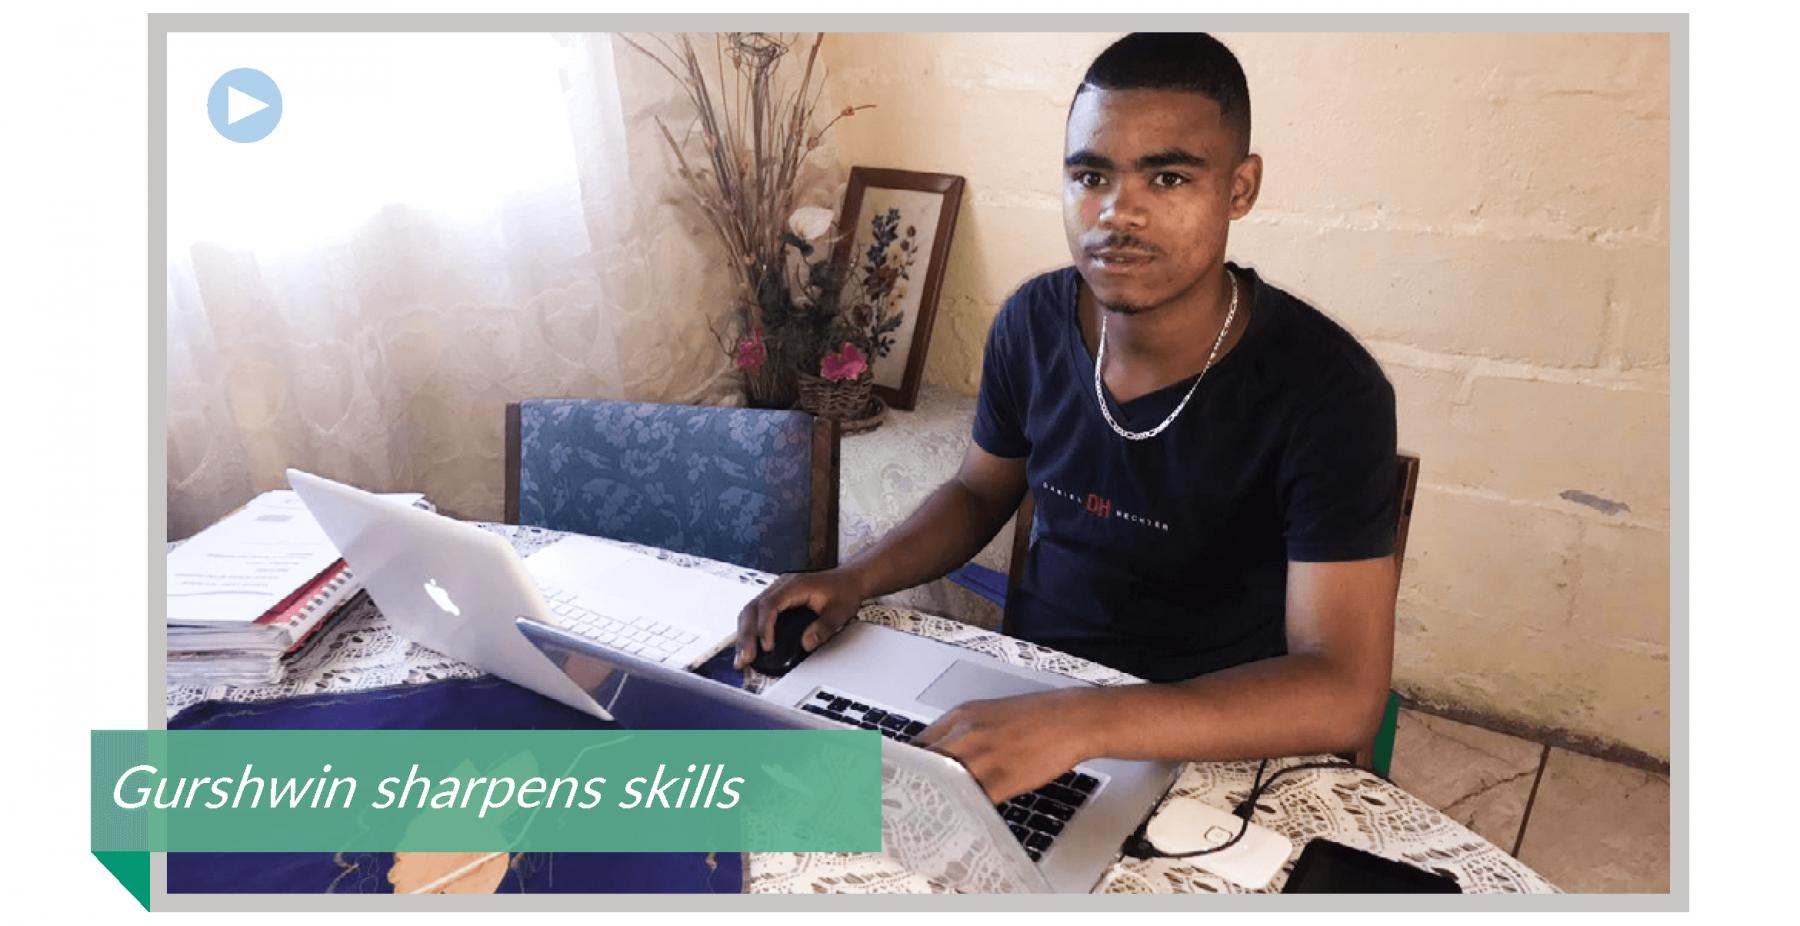 Sharpening Computing Skills